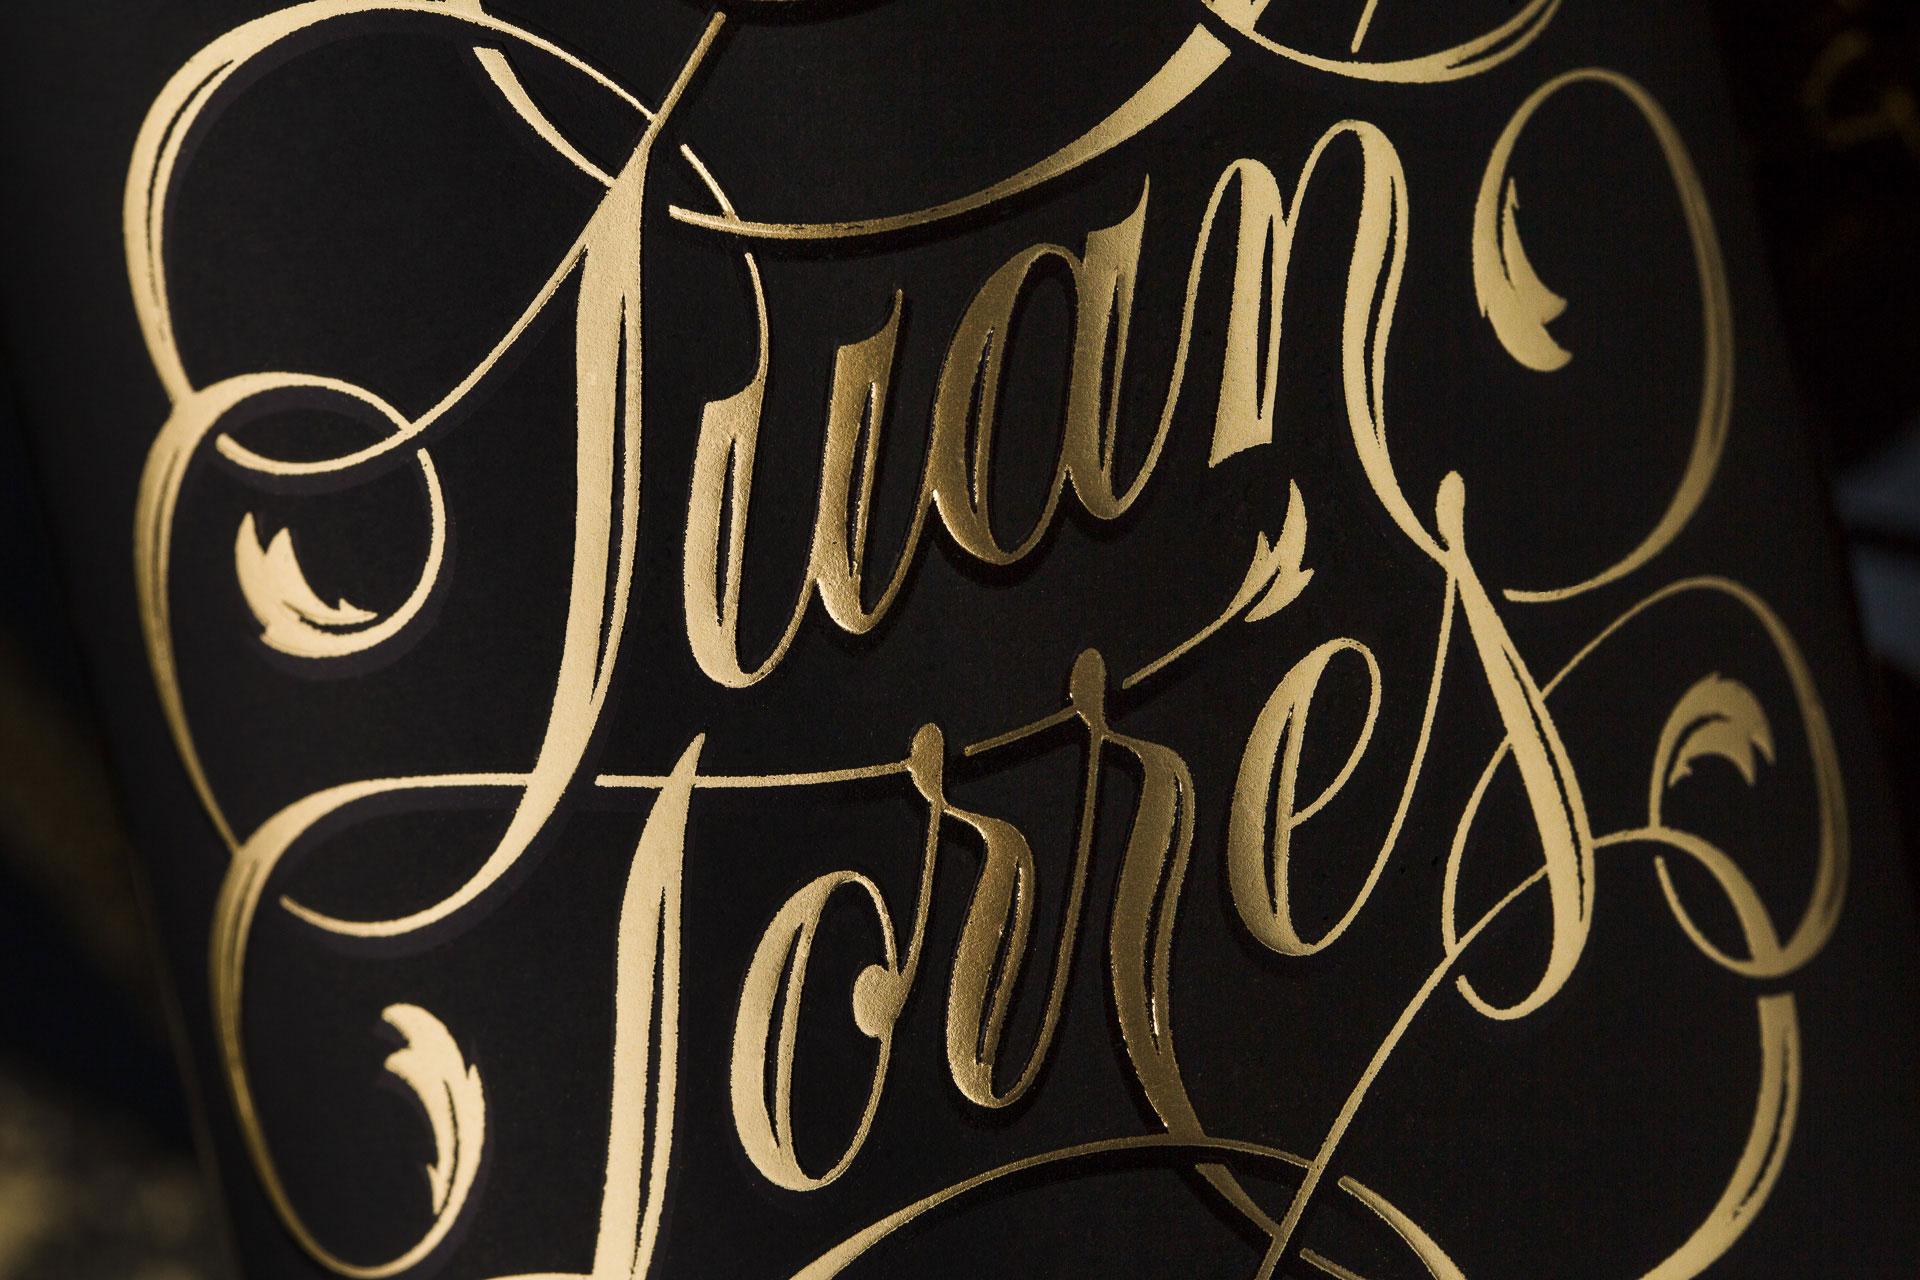 Detalle etiqueta Juan Torres